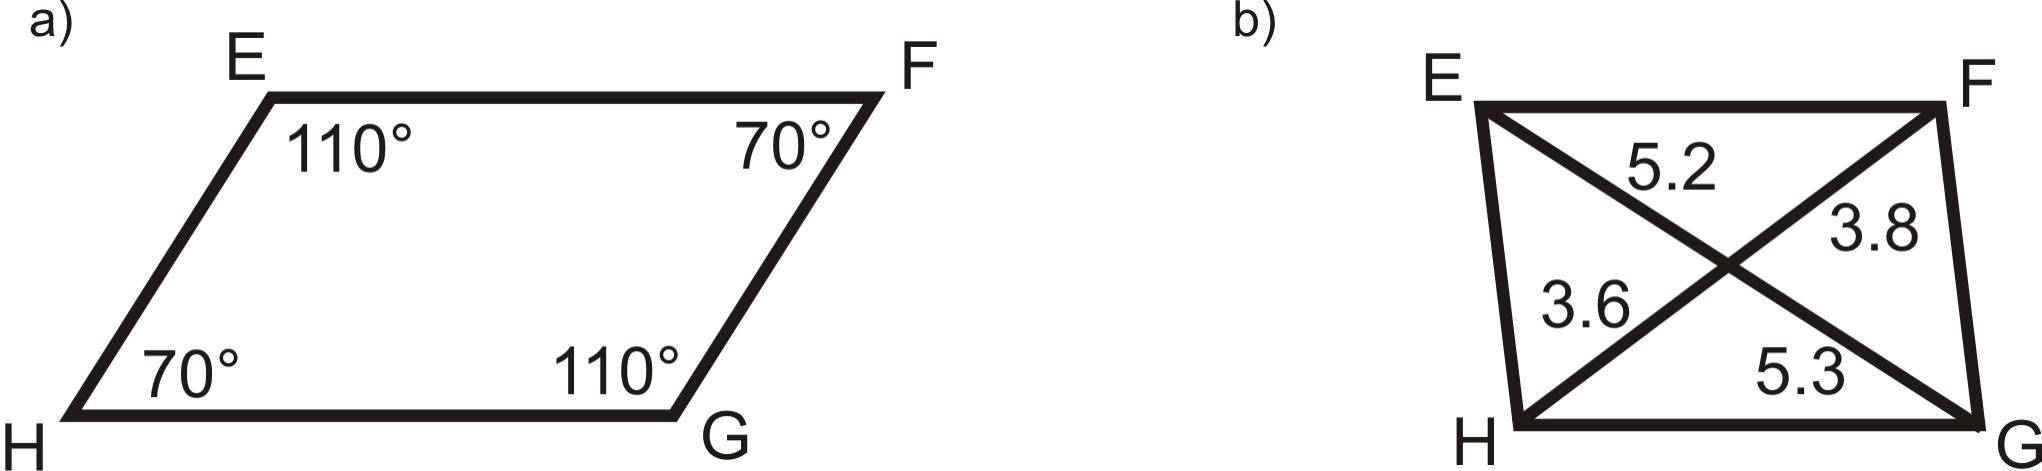 Alternate Parallelogram Interior Angles